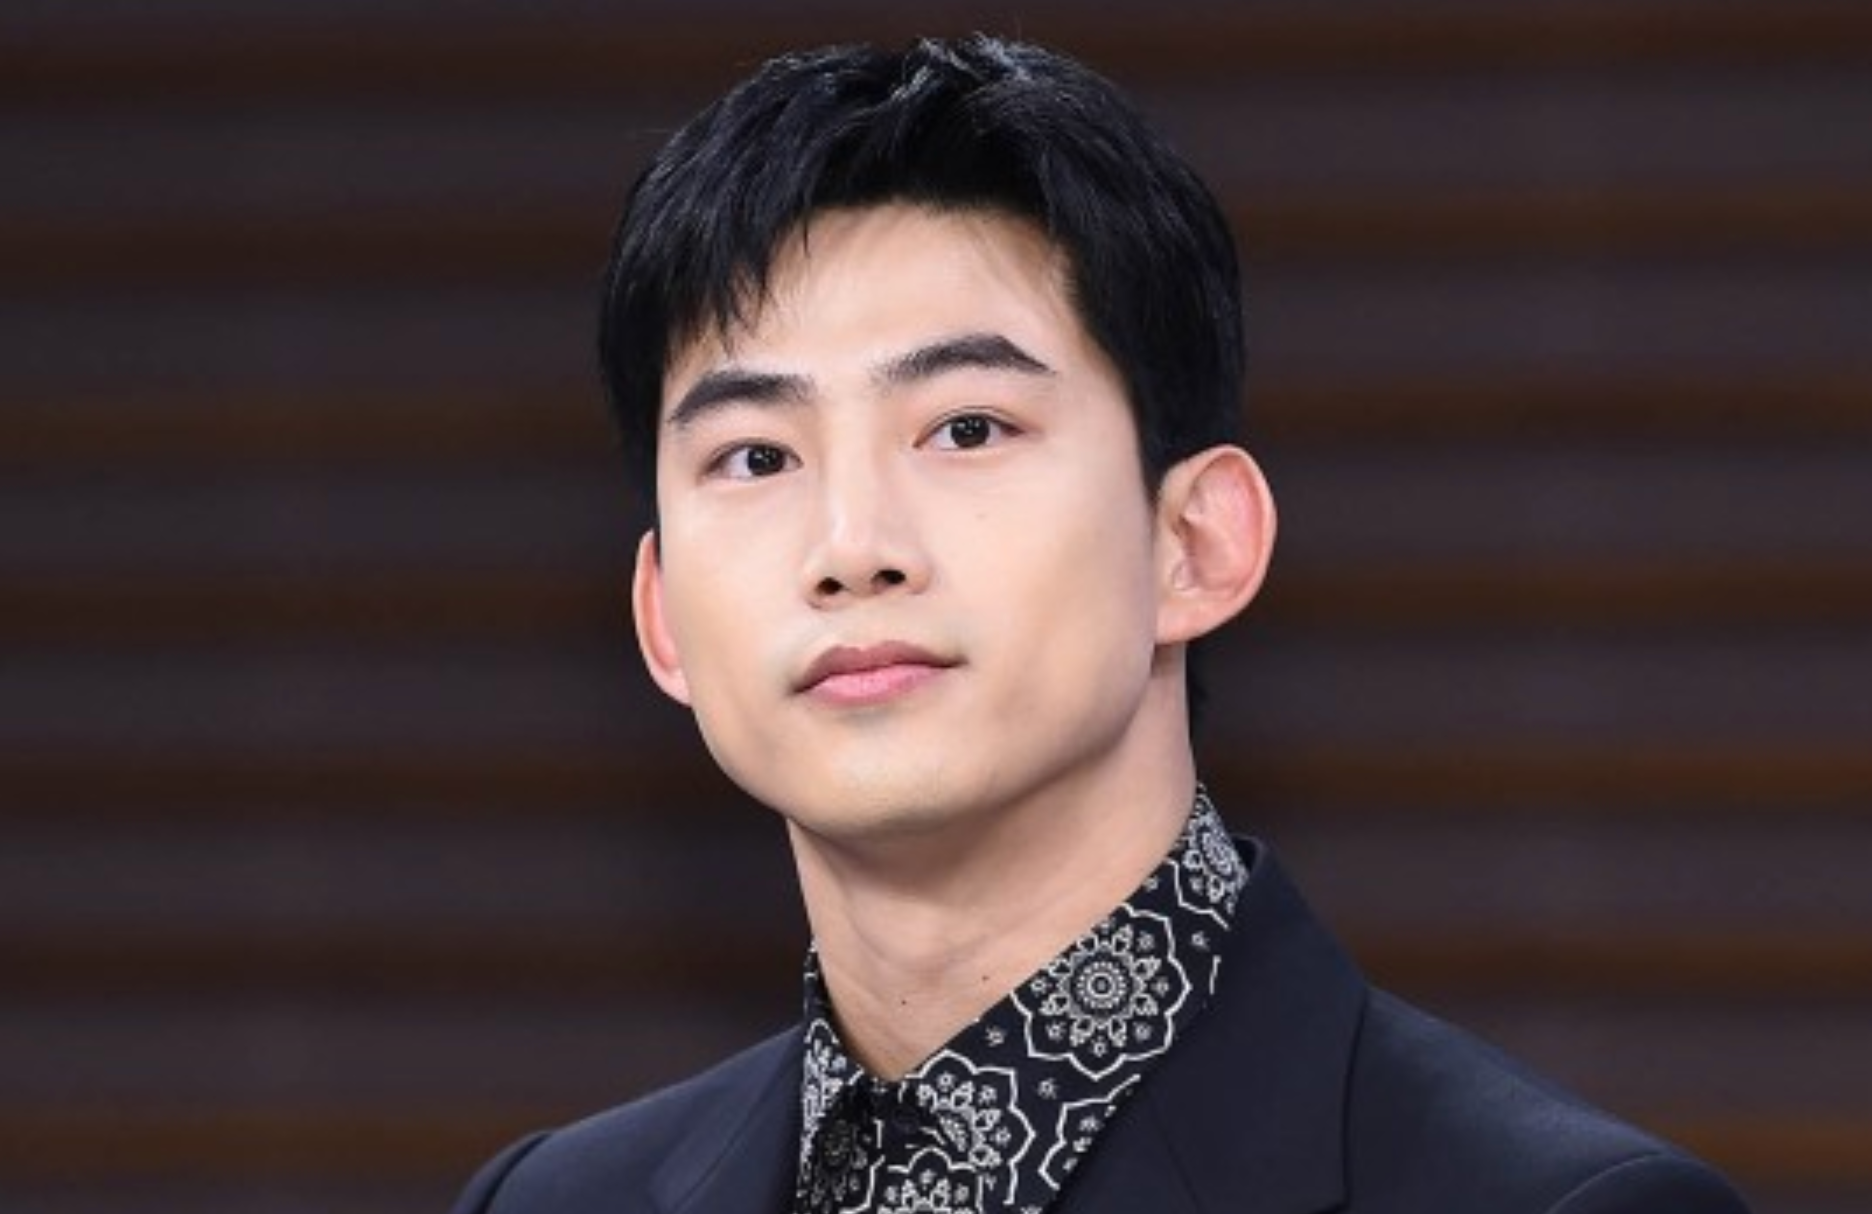 Girlfriend ok taecyeon UPDATE: 2PM